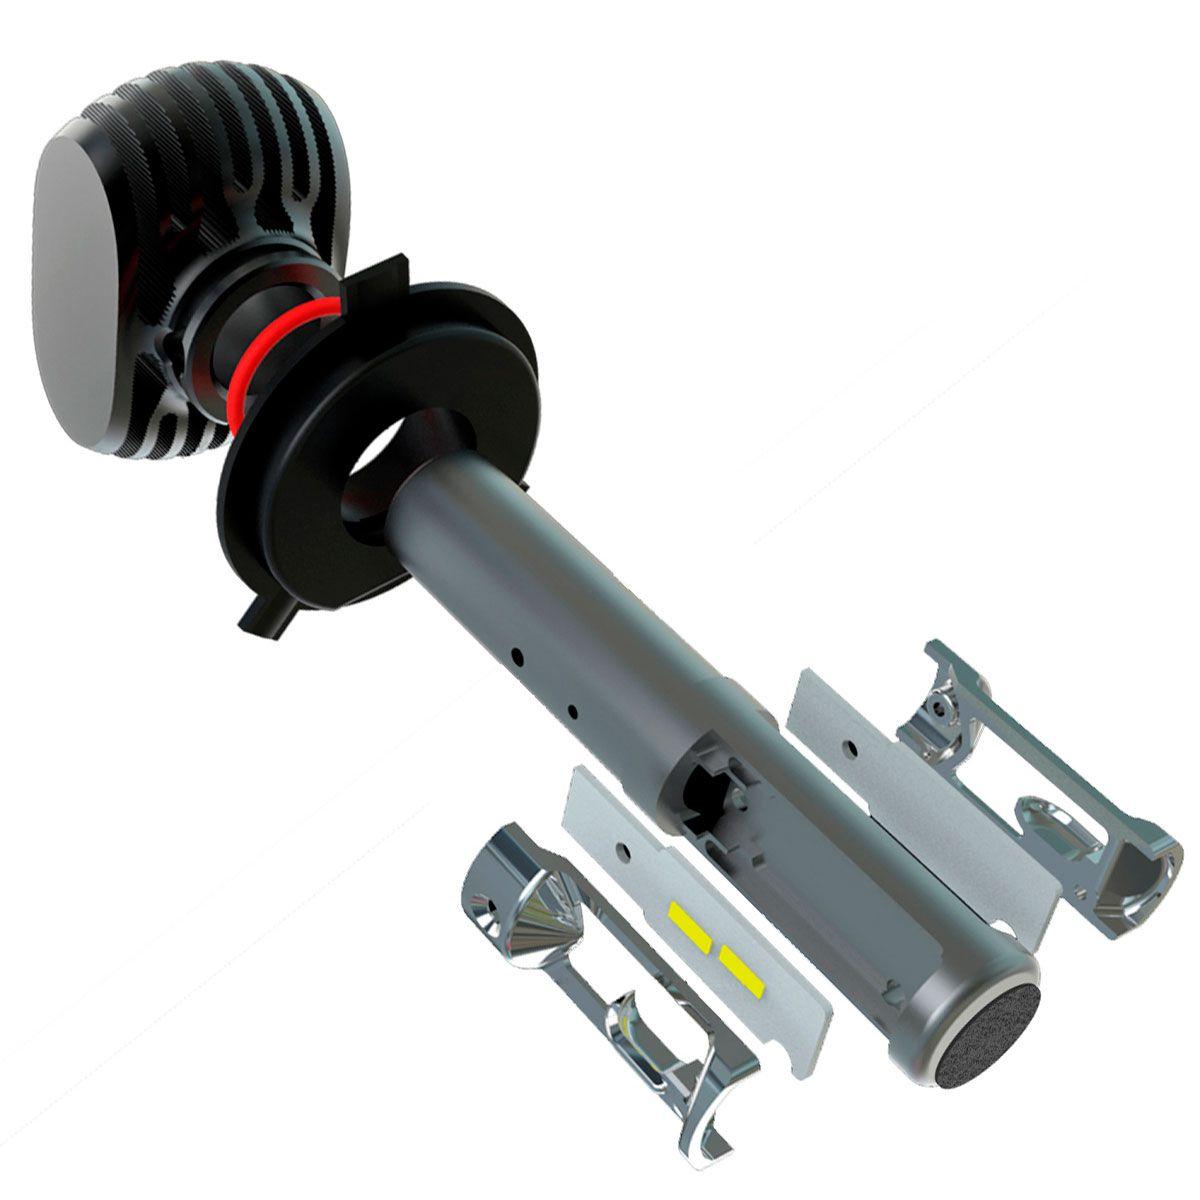 Kit Ultra LED Peugeot 206 2001 até 2009 farol duplo tipo xenon farol baixo H7 50W